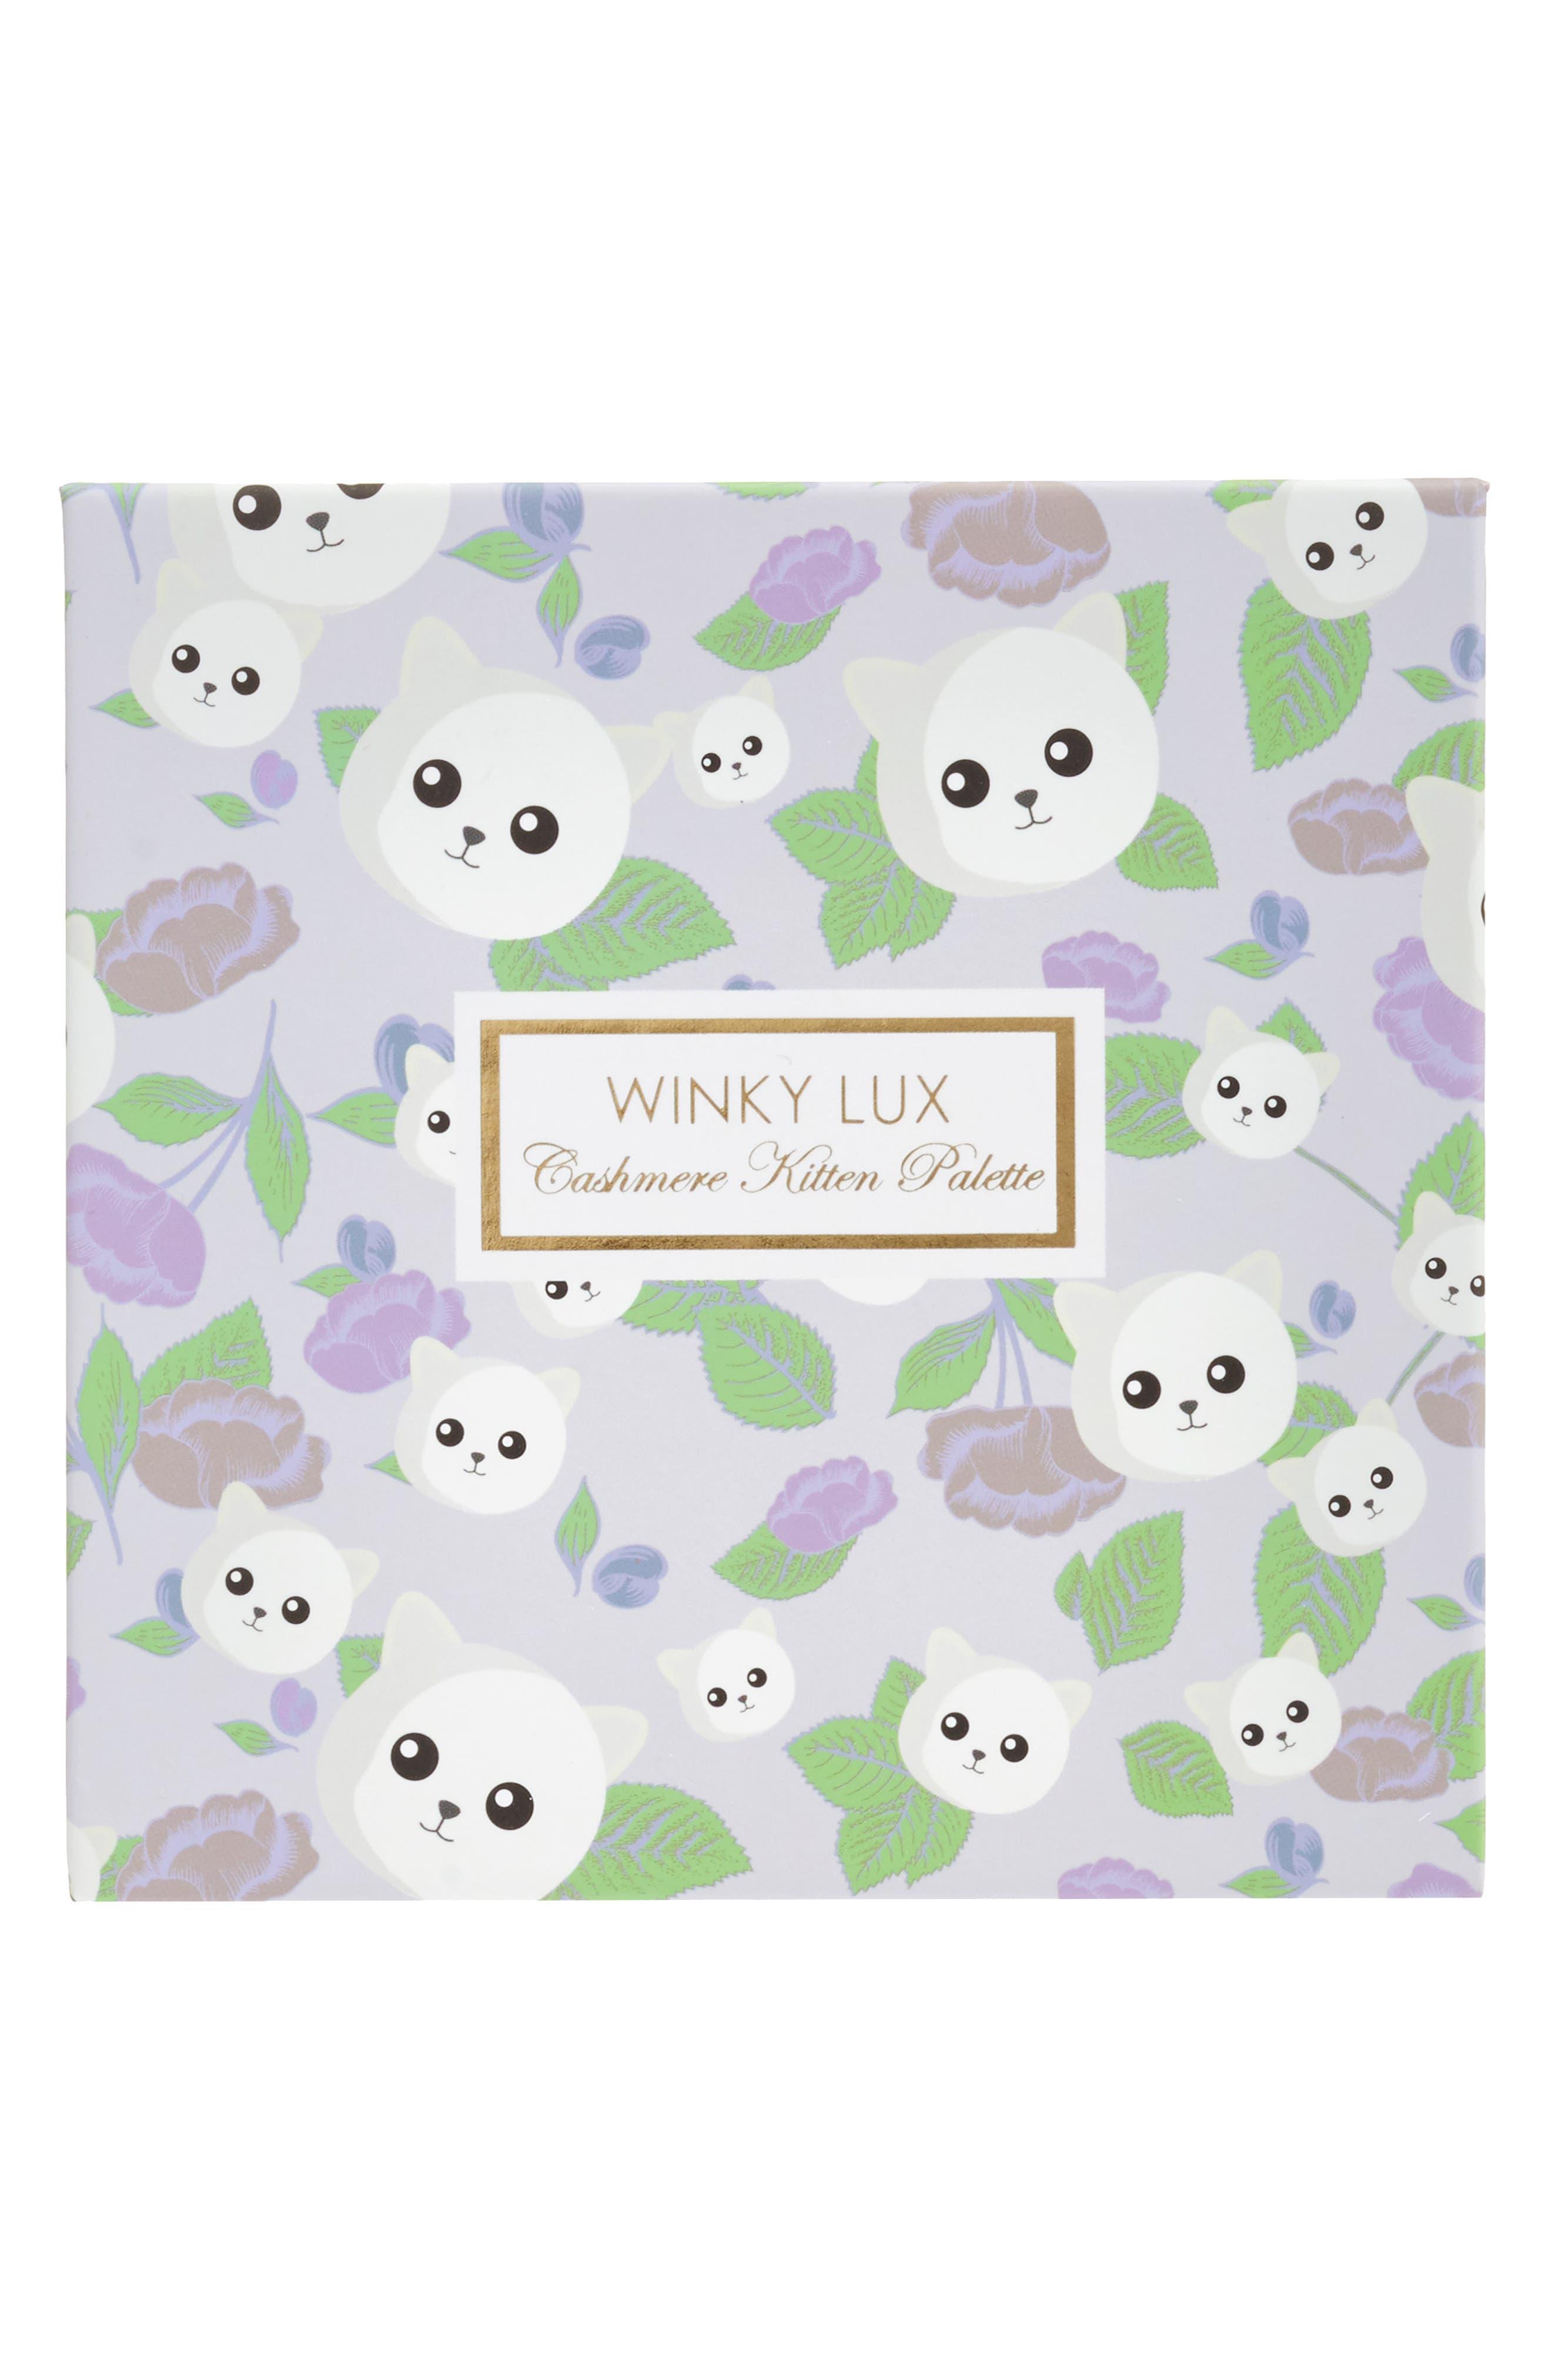 WINKY LUX, Cashmere Kitten Palette, Alternate thumbnail 2, color, 000